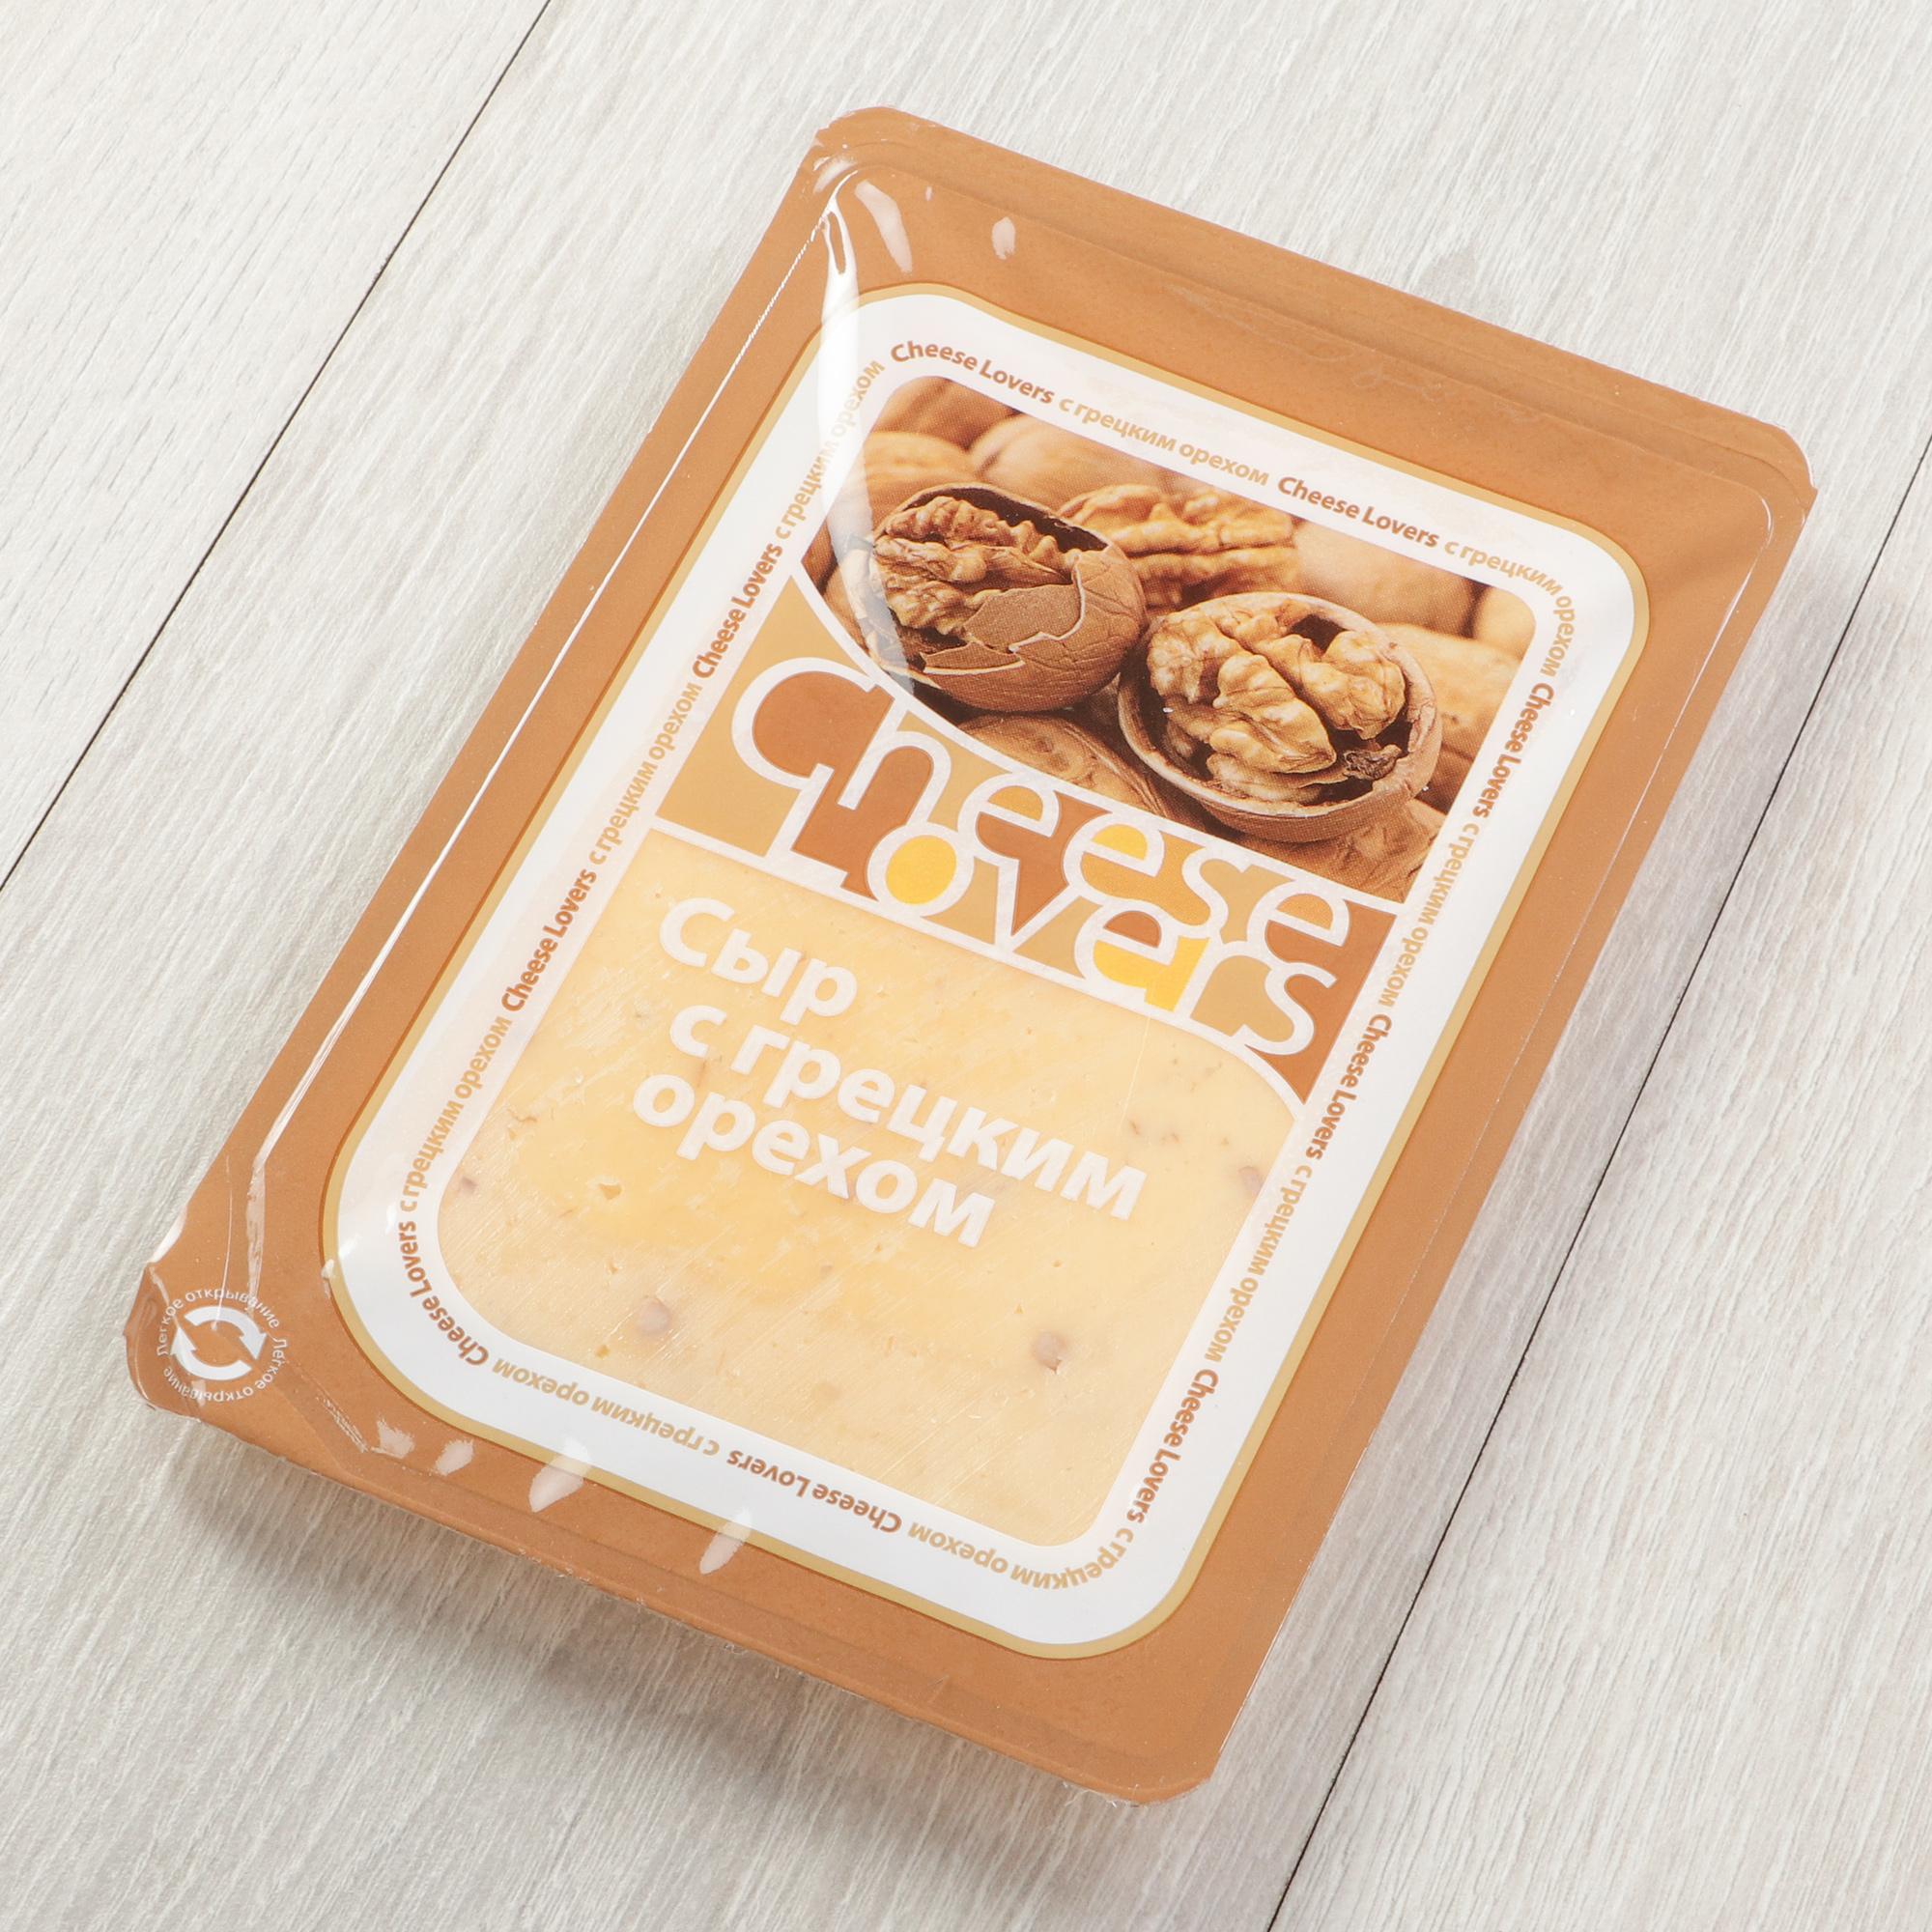 Сыр Cheeze Lovers с грецким орехом 50% 150 г недорого